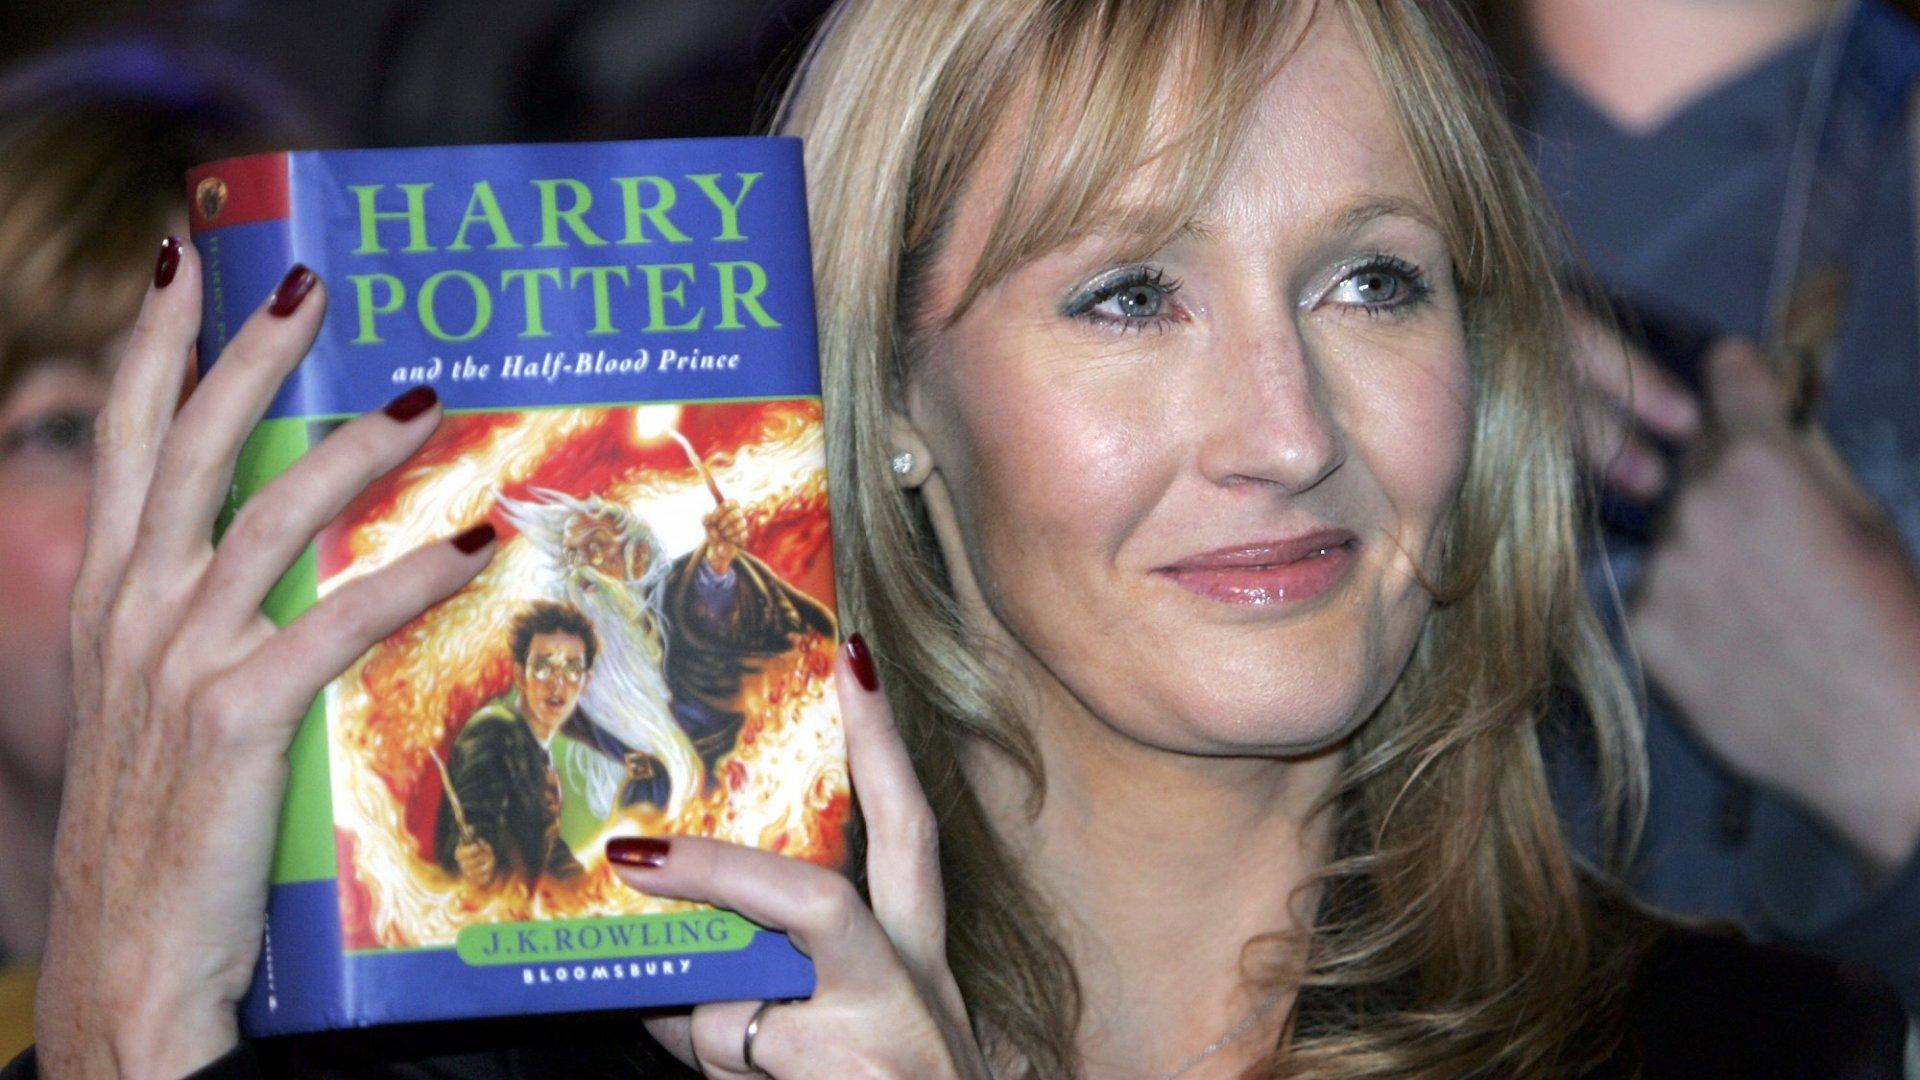 Here's Why J.K. Rowling, Jeff Bezos, and Barack Obama Embrace Failure